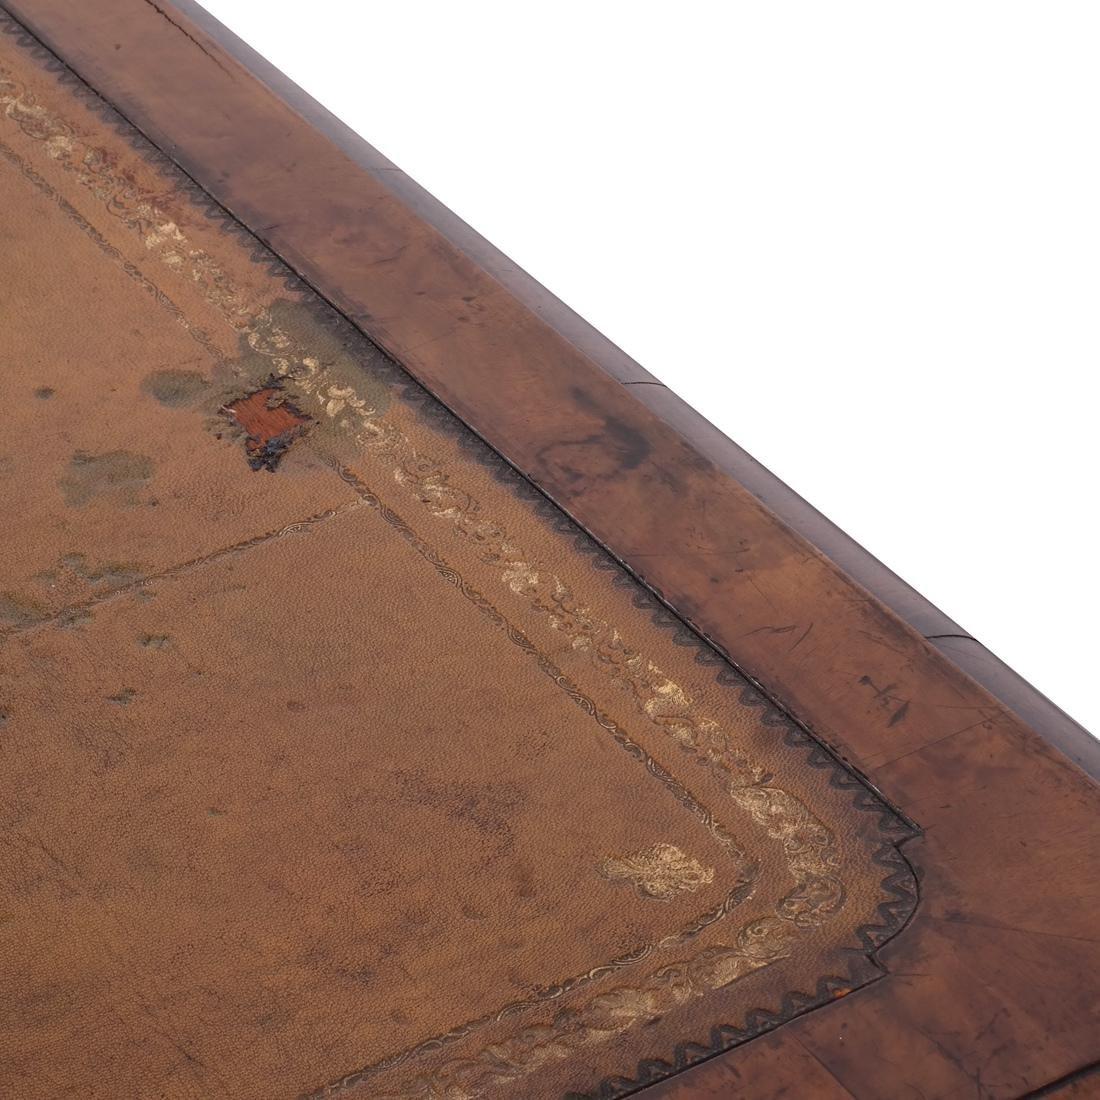 Walnut Tooled Leather Bureau Plat - 8